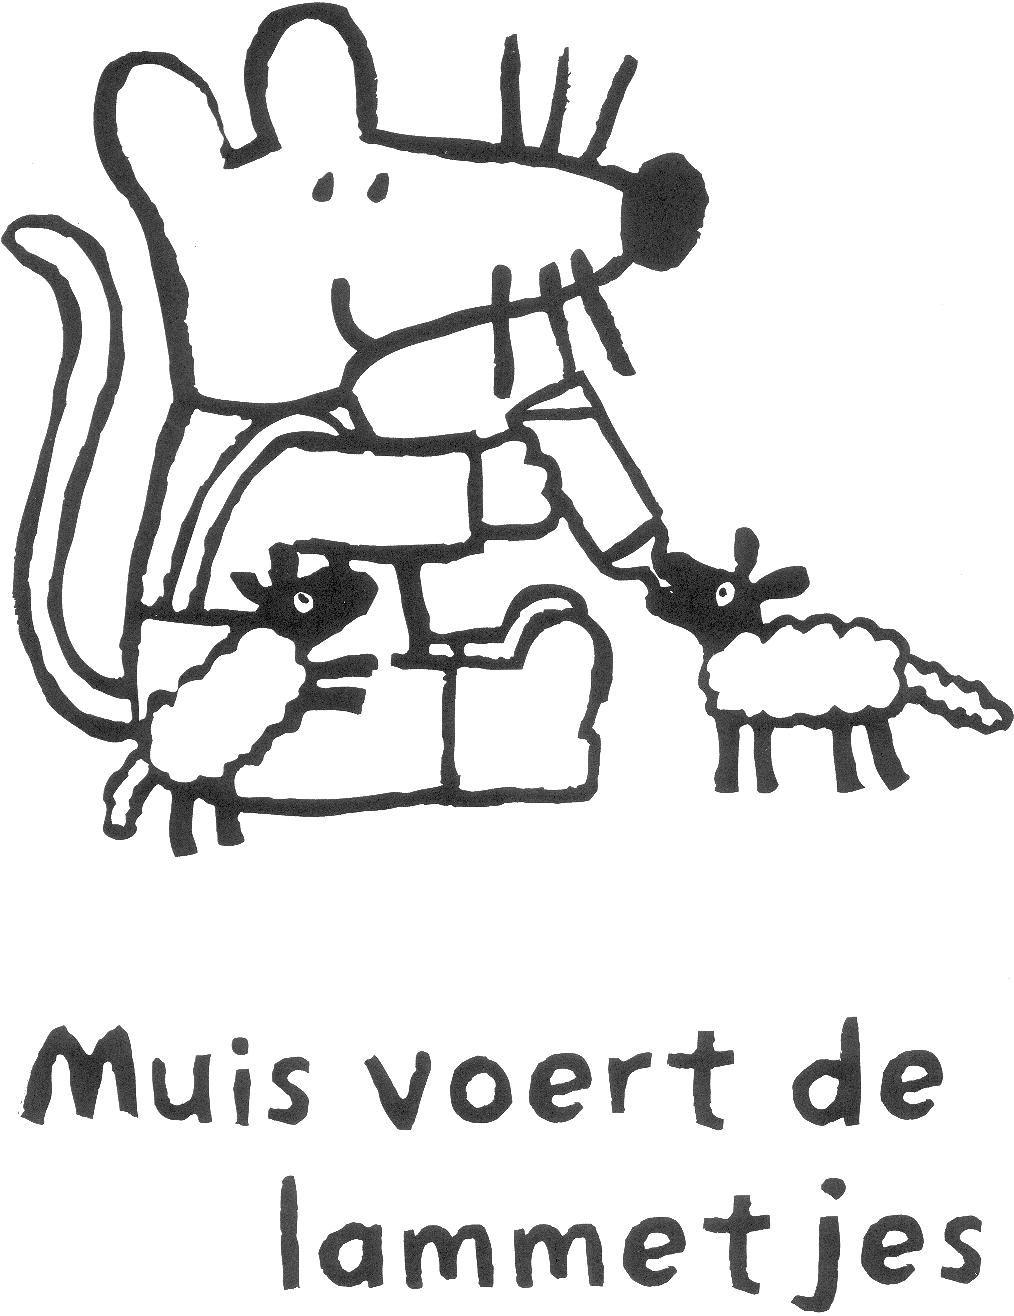 Muis voert de lammetjes | maisy mouse | Pinterest